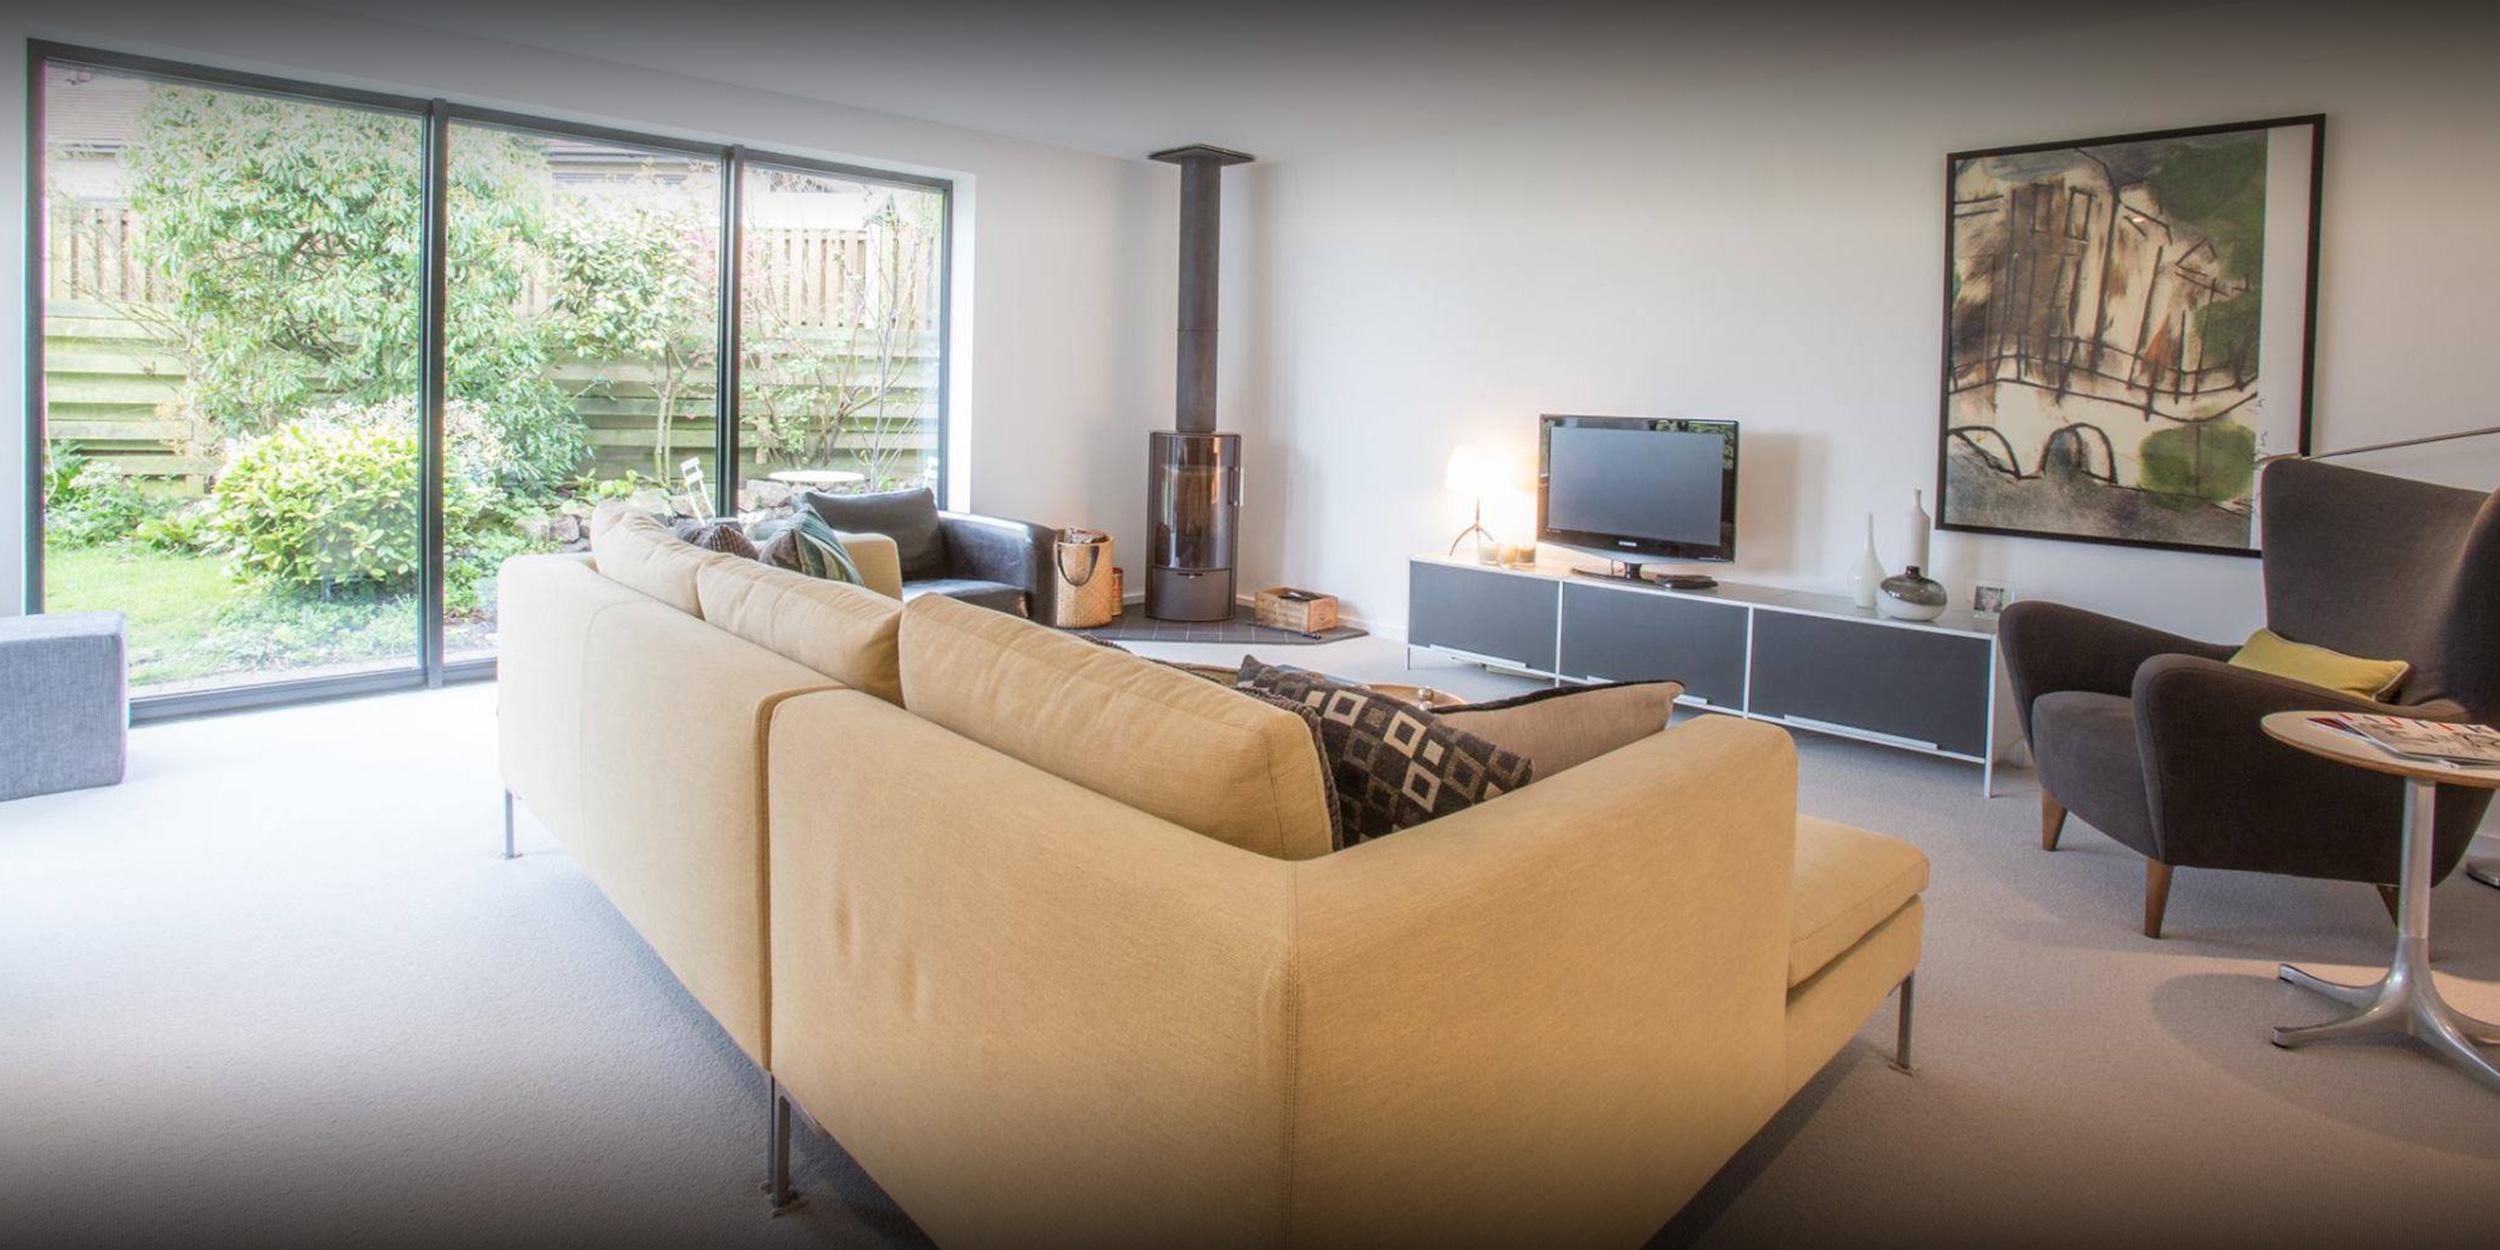 House-Renovation-Sheffield-Tom-Lane